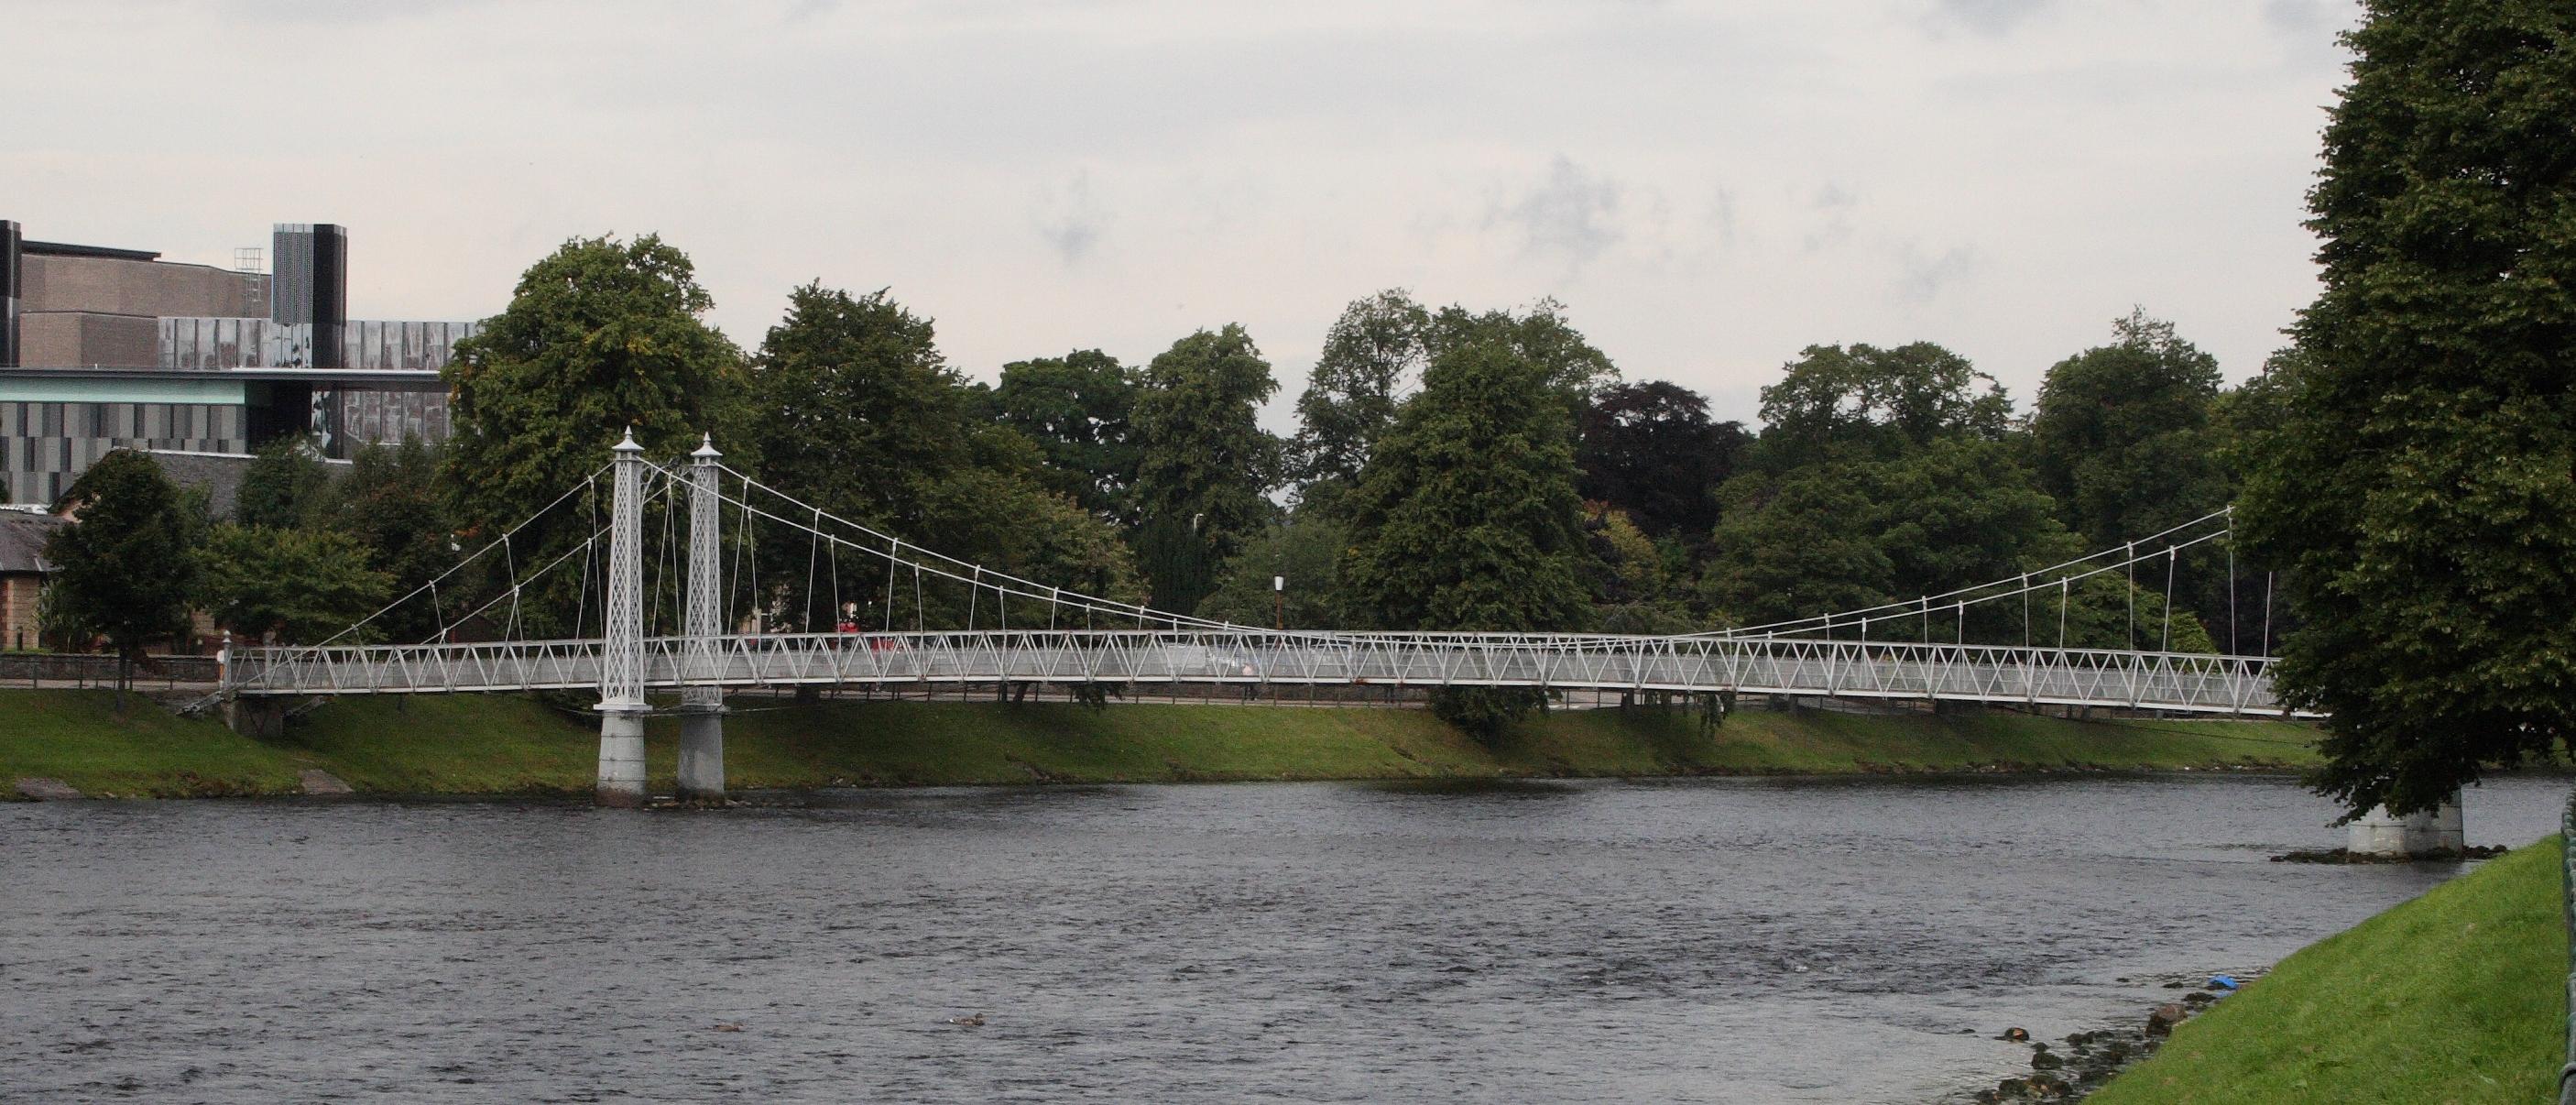 Hängebrücke über den River Ness